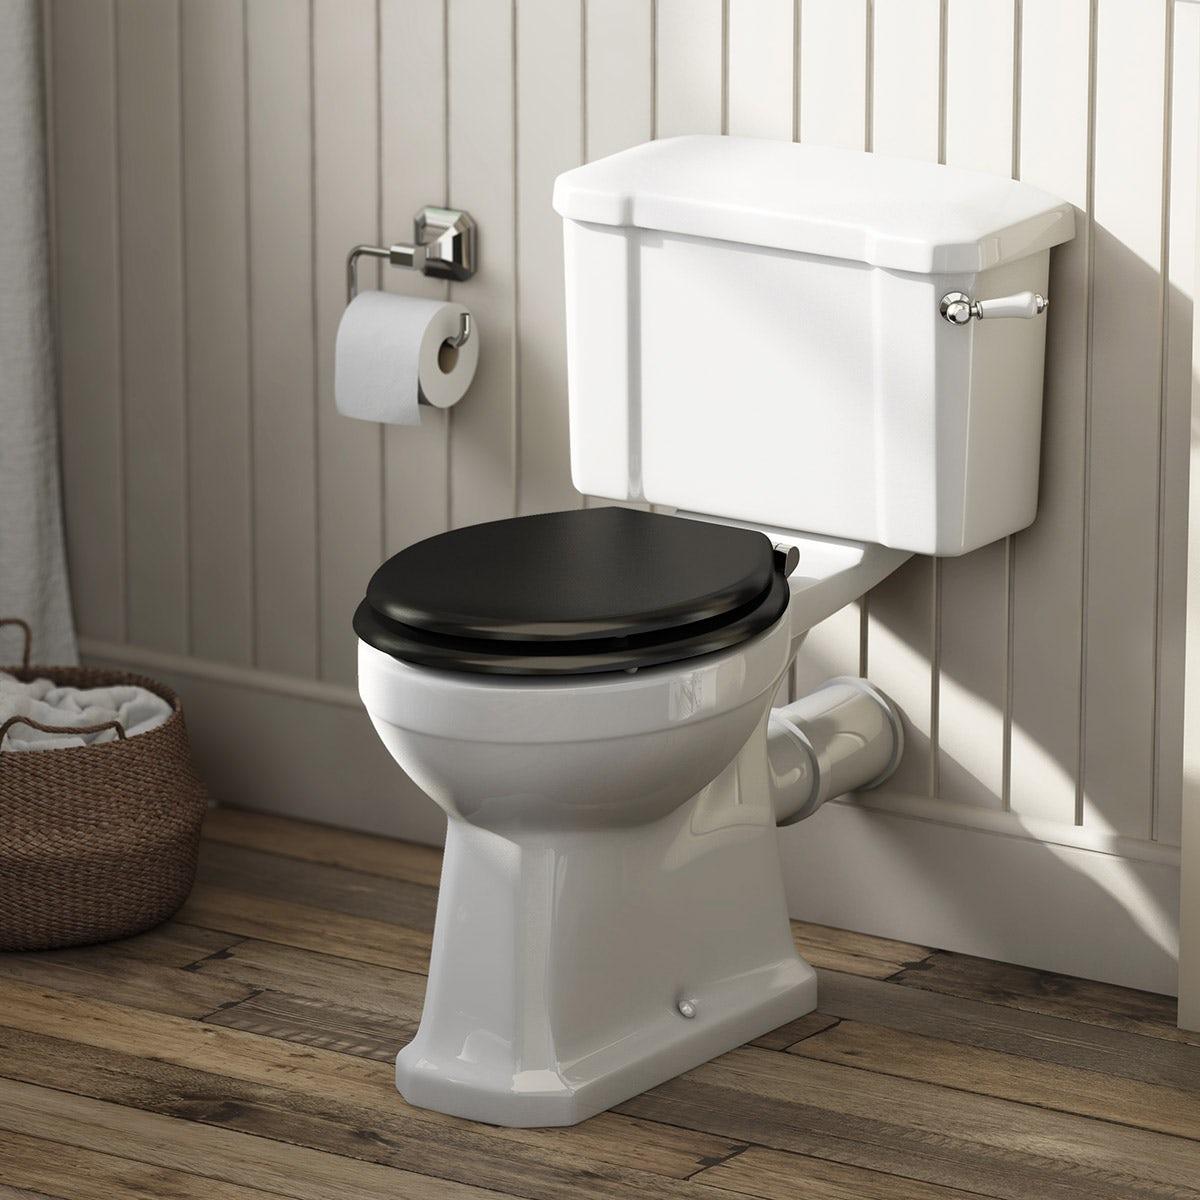 solid wood slow close toilet seat. Black Wooden Soft Close Toilet Seat Collection Solid Wood Slow Dark  SeatDark Laura Roper Rhodes Greenwich d3press us 100 Images Home